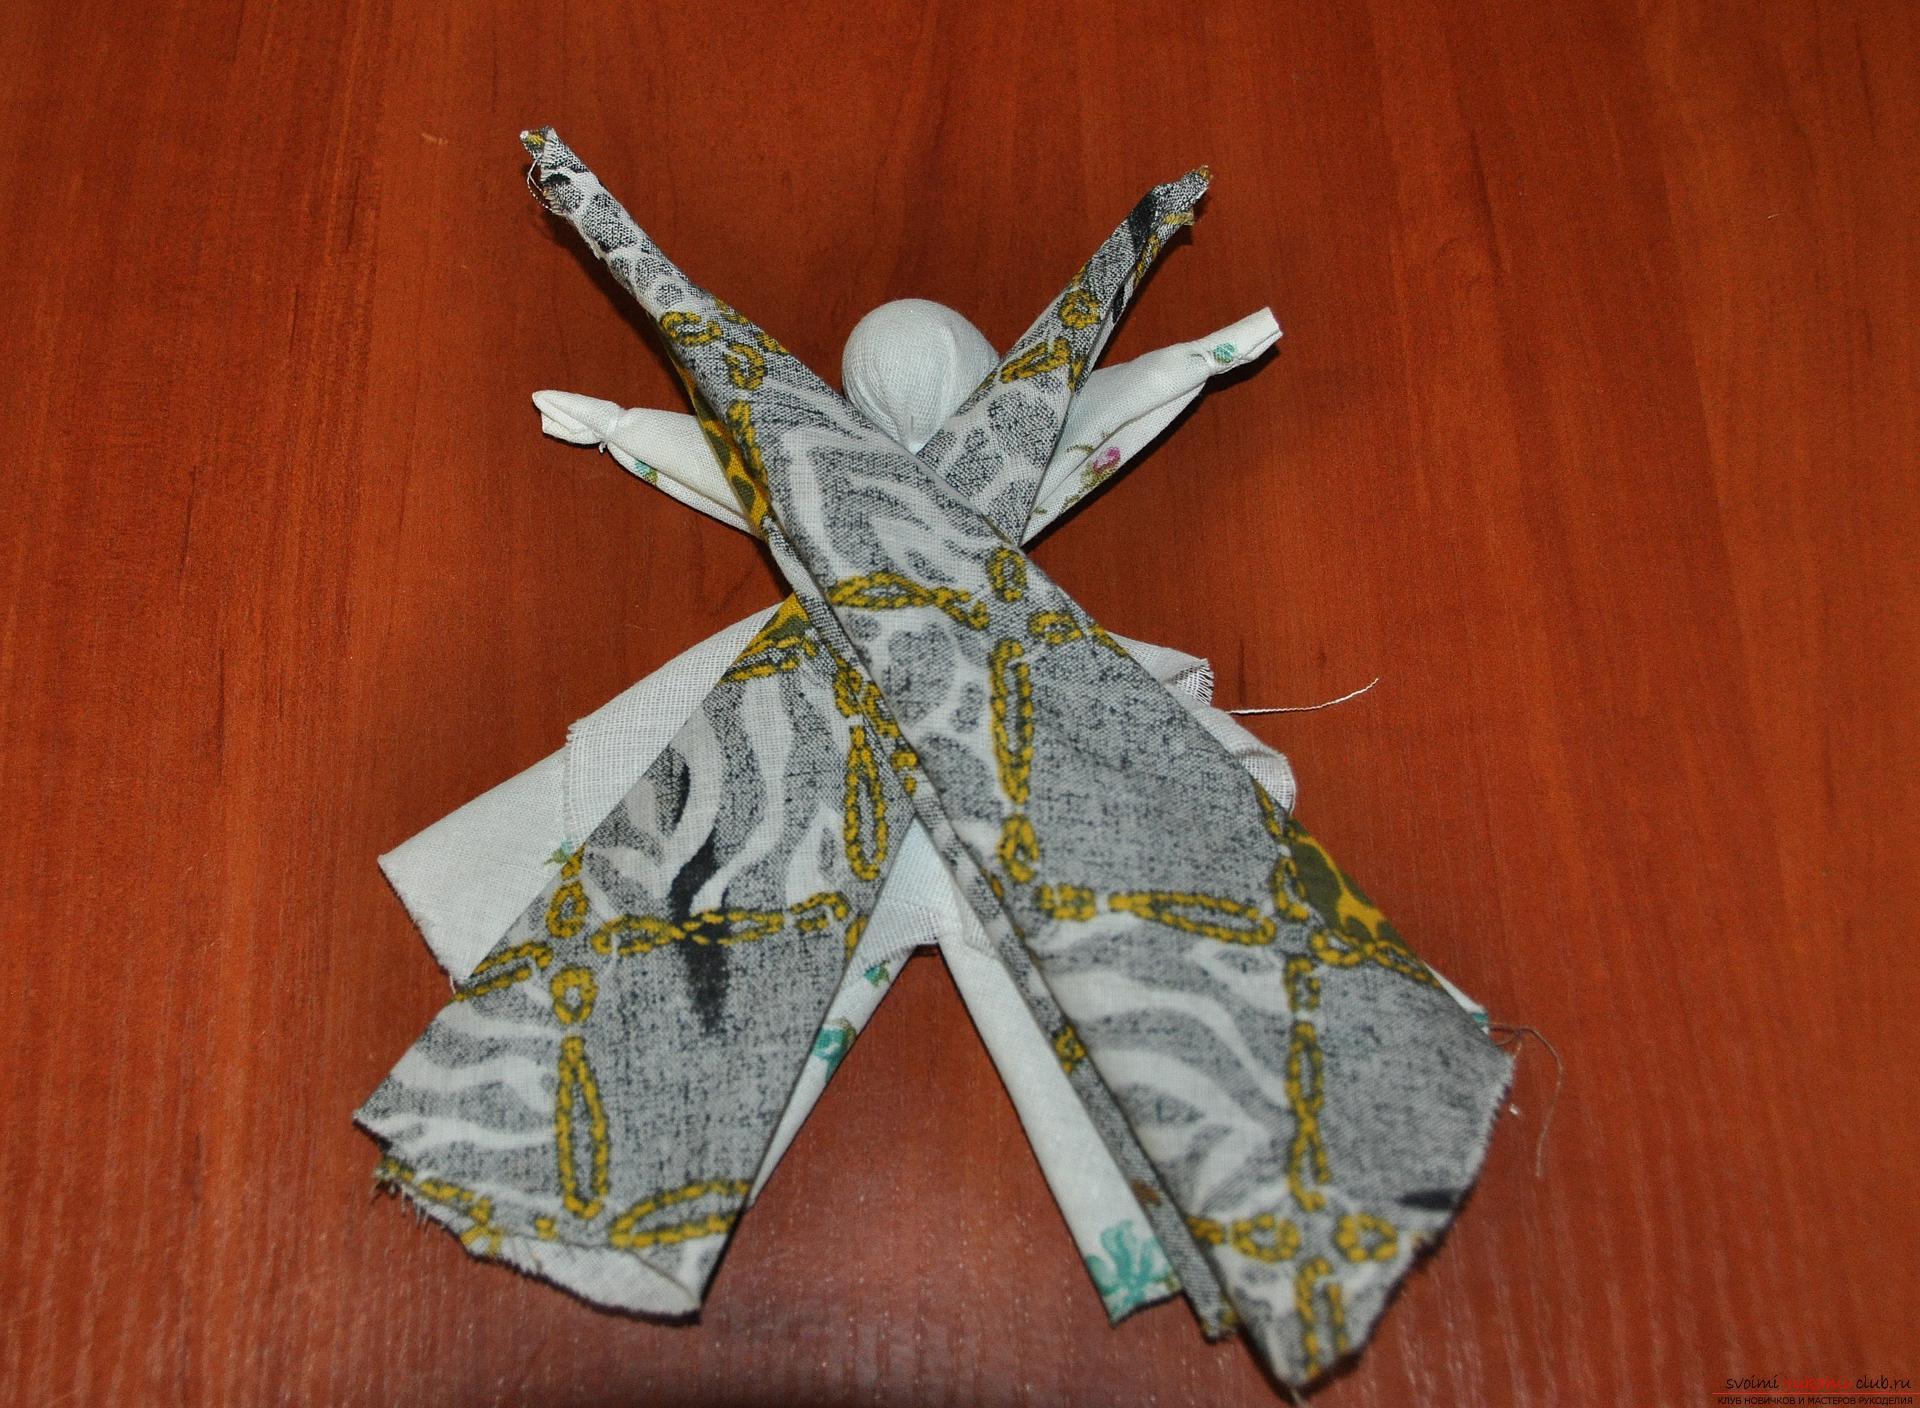 Этот мастер-класс научит как изготовить своими руками куклу-берегиню - столбушку. Фото №15